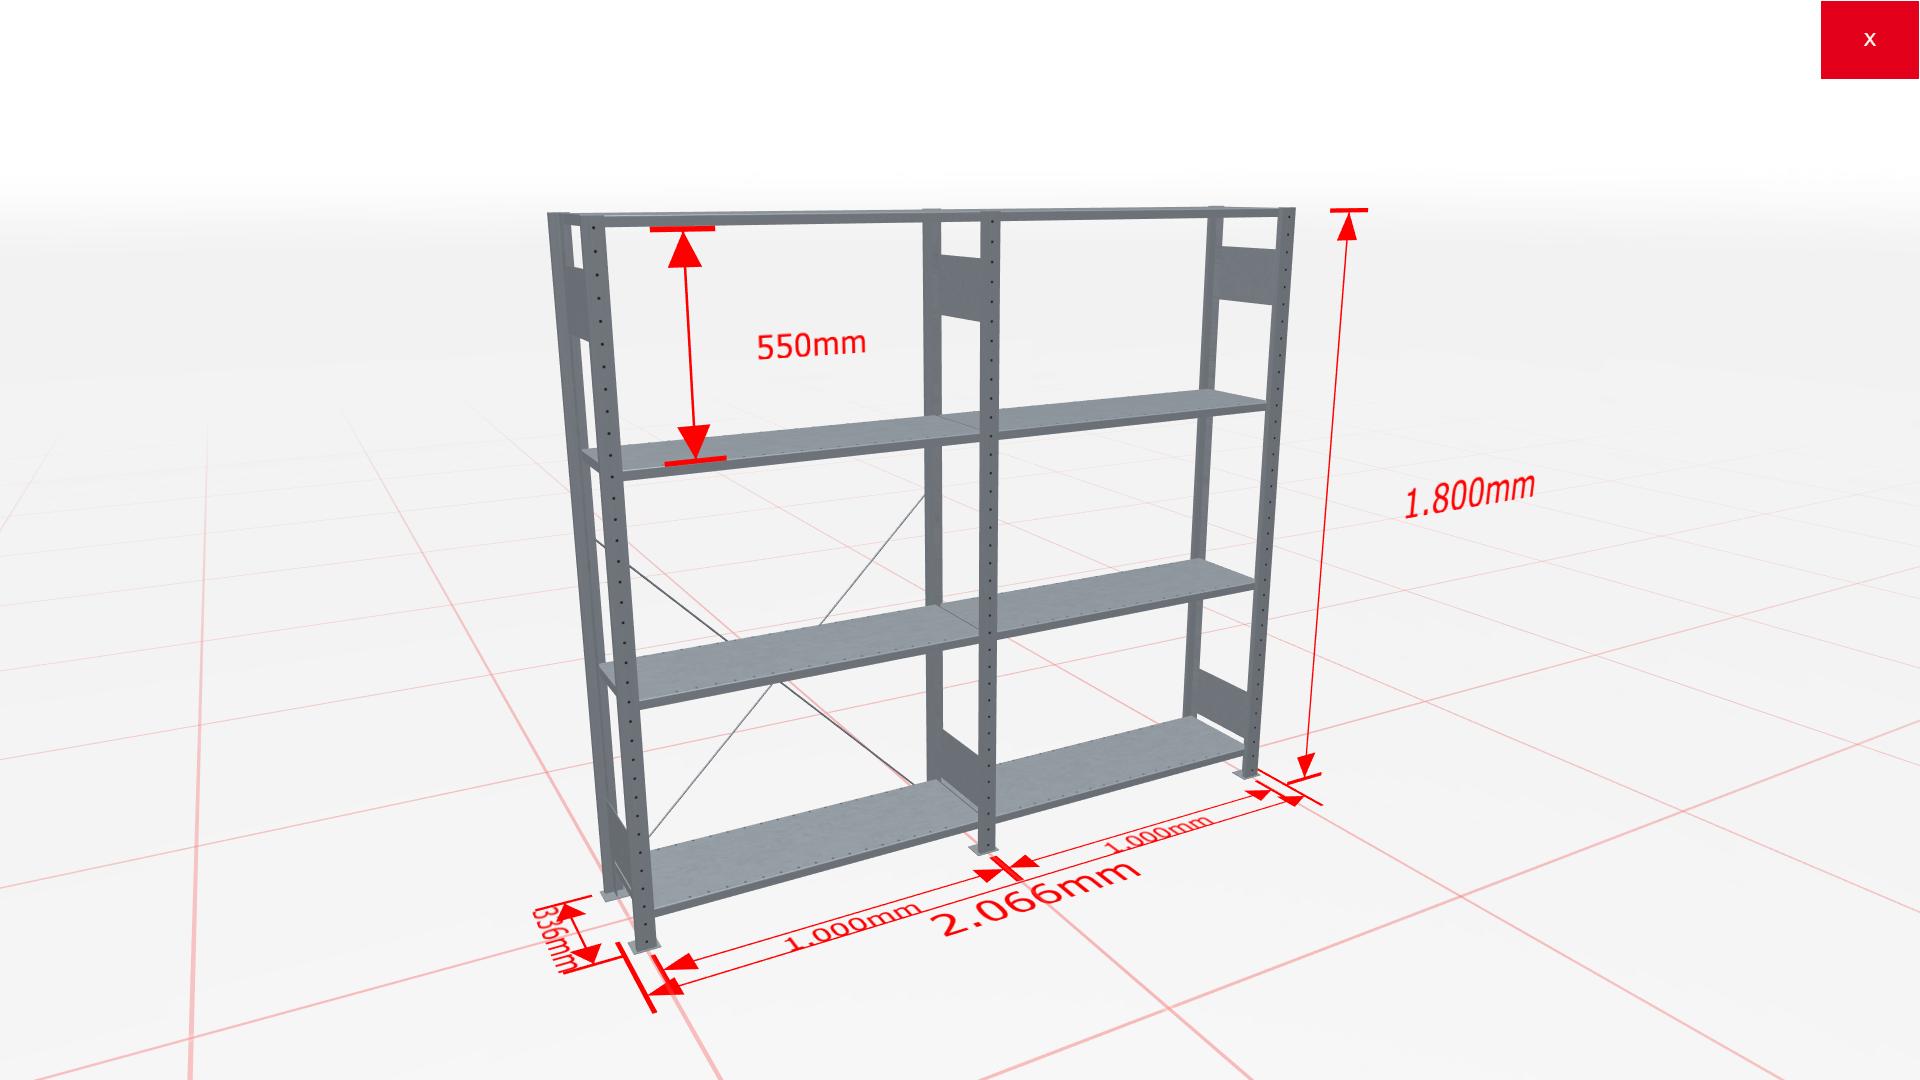 Fachbodenregal Komplettregal 1800x2066x300 mm (HxBxT) SCHULTE Lagertechnik verzinkt 4 Ebenen  150 kg je Boden